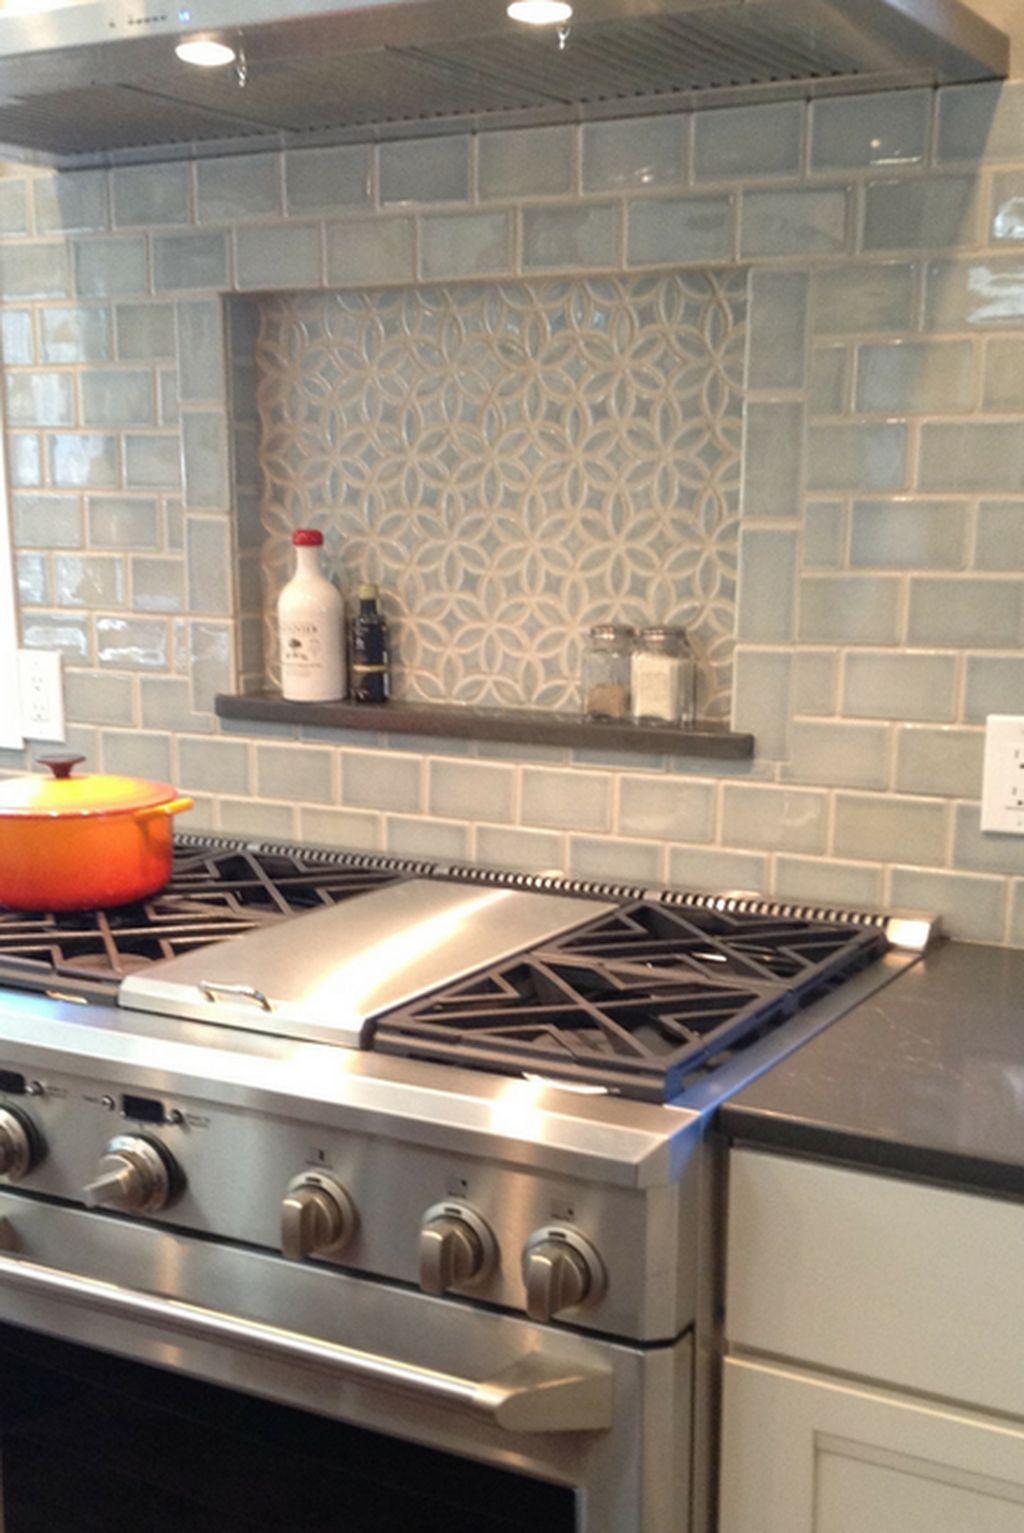 39 Beautiful Farmhouse Kitchen Backsplash Ideas Farmhouse Kitchen Backsplash Kitchen Design Kitchen Remodel Kitchen range backsplash ideas